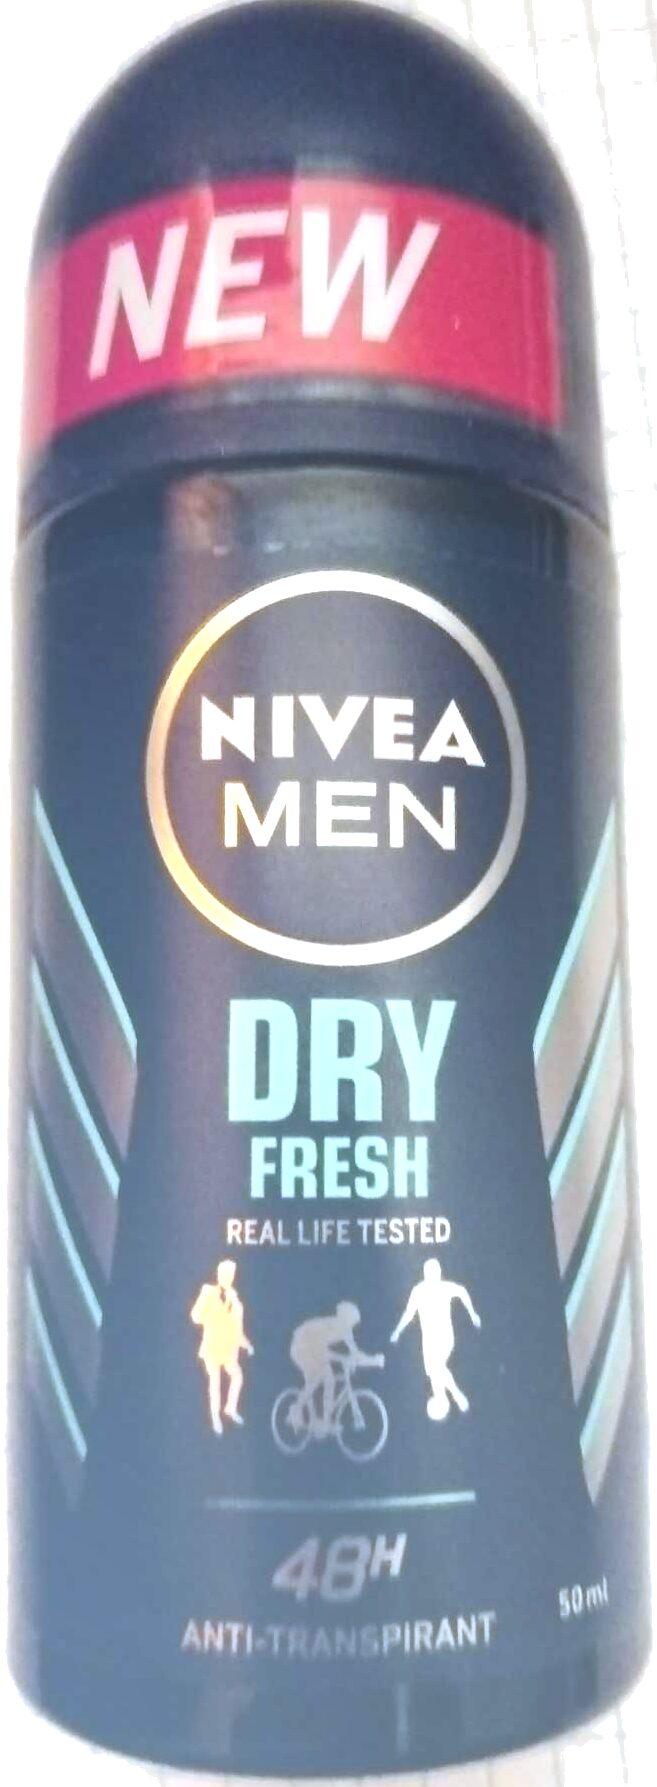 Dry Fresh Real Life Tested 48h - Produit - en